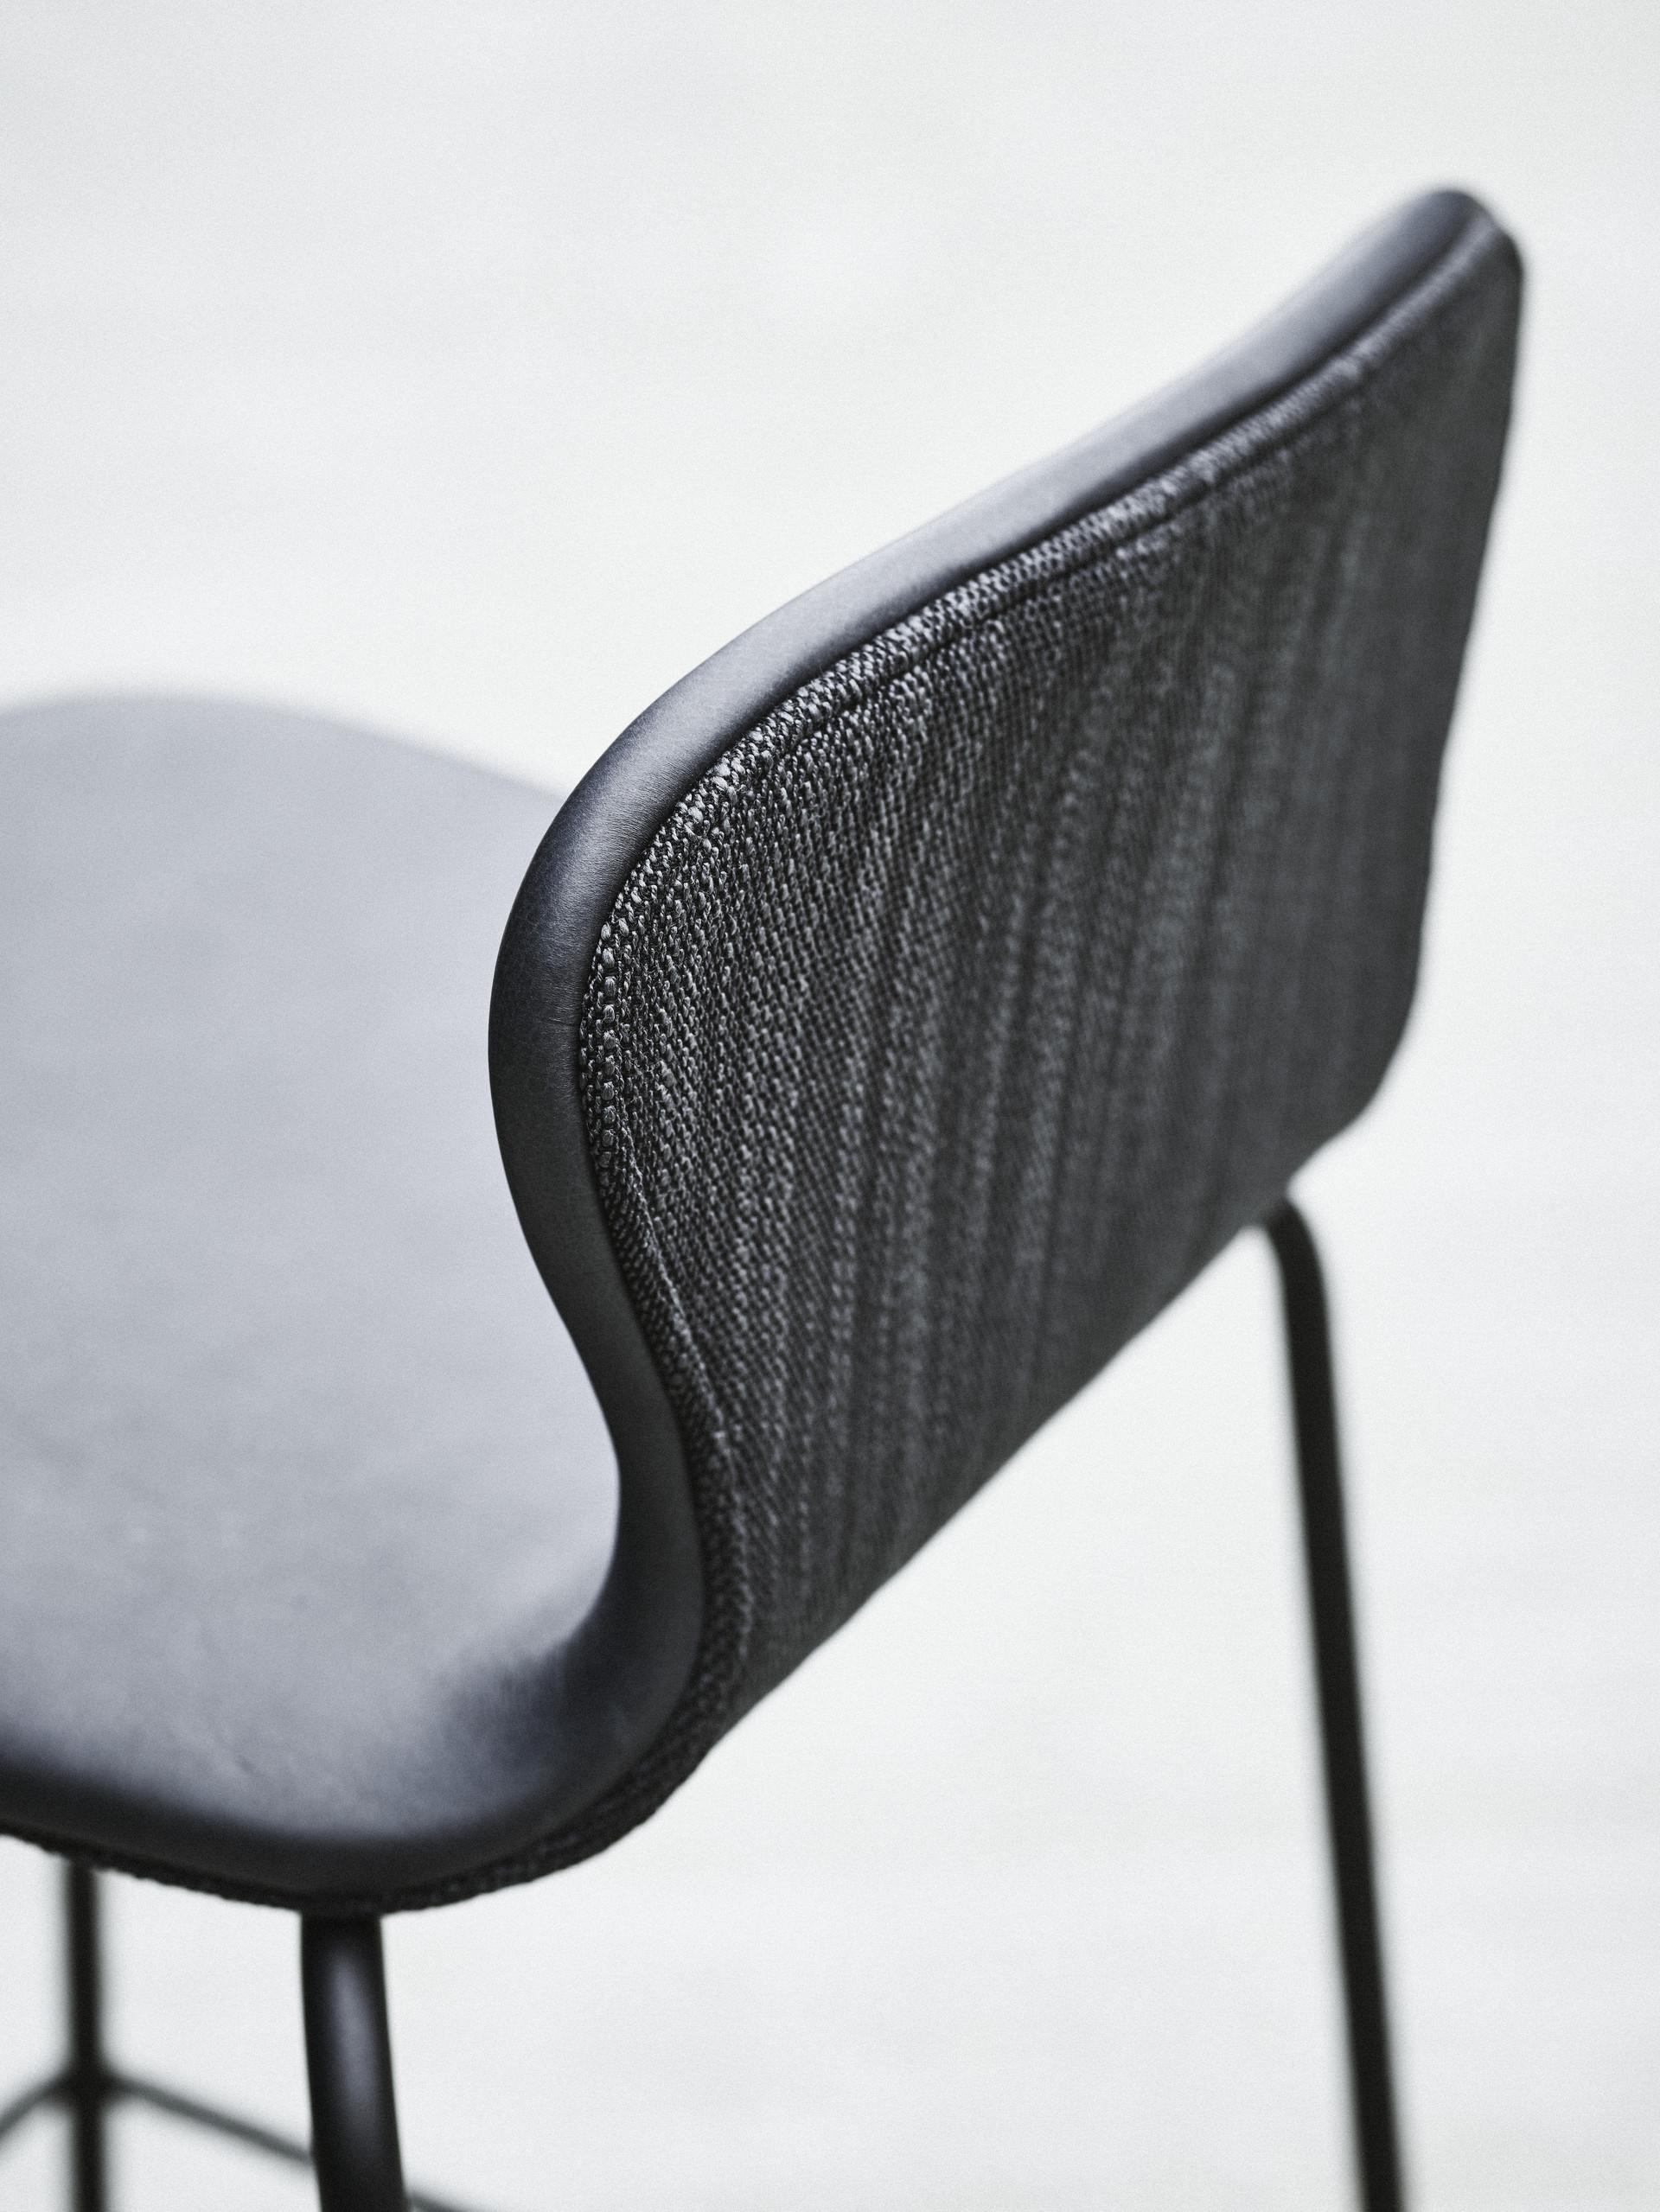 Barstuhl PLAYchar bar Sitzhöhe 65cm 01